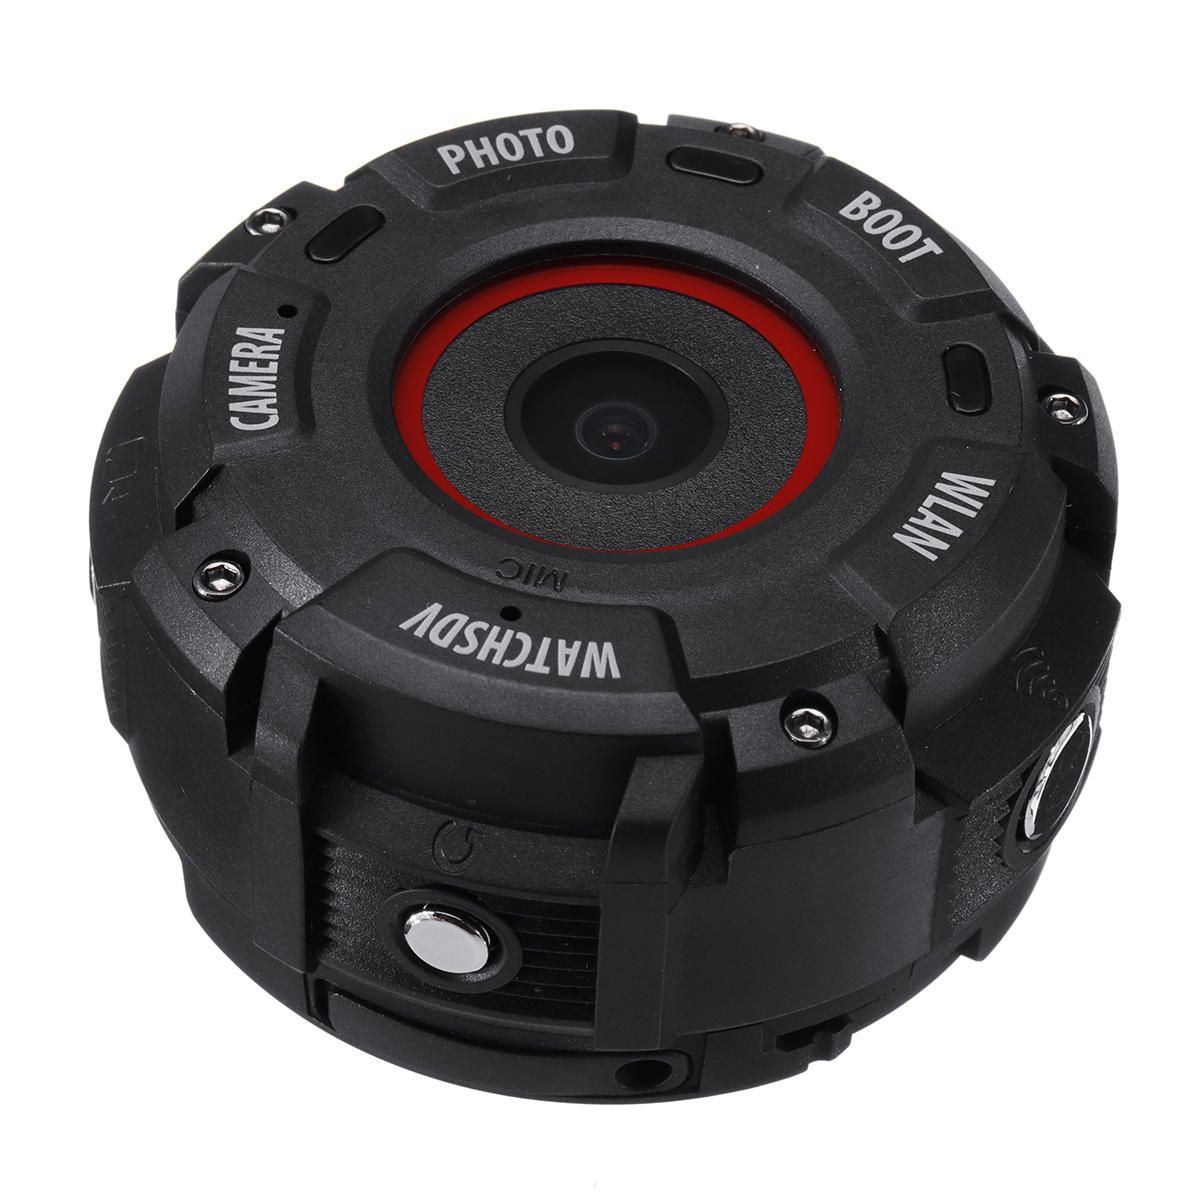 JEC US$80.84 WiFi HD 1080P Sport Watch Camera Swim Diving DVR Video Recorder 30M Waterproof